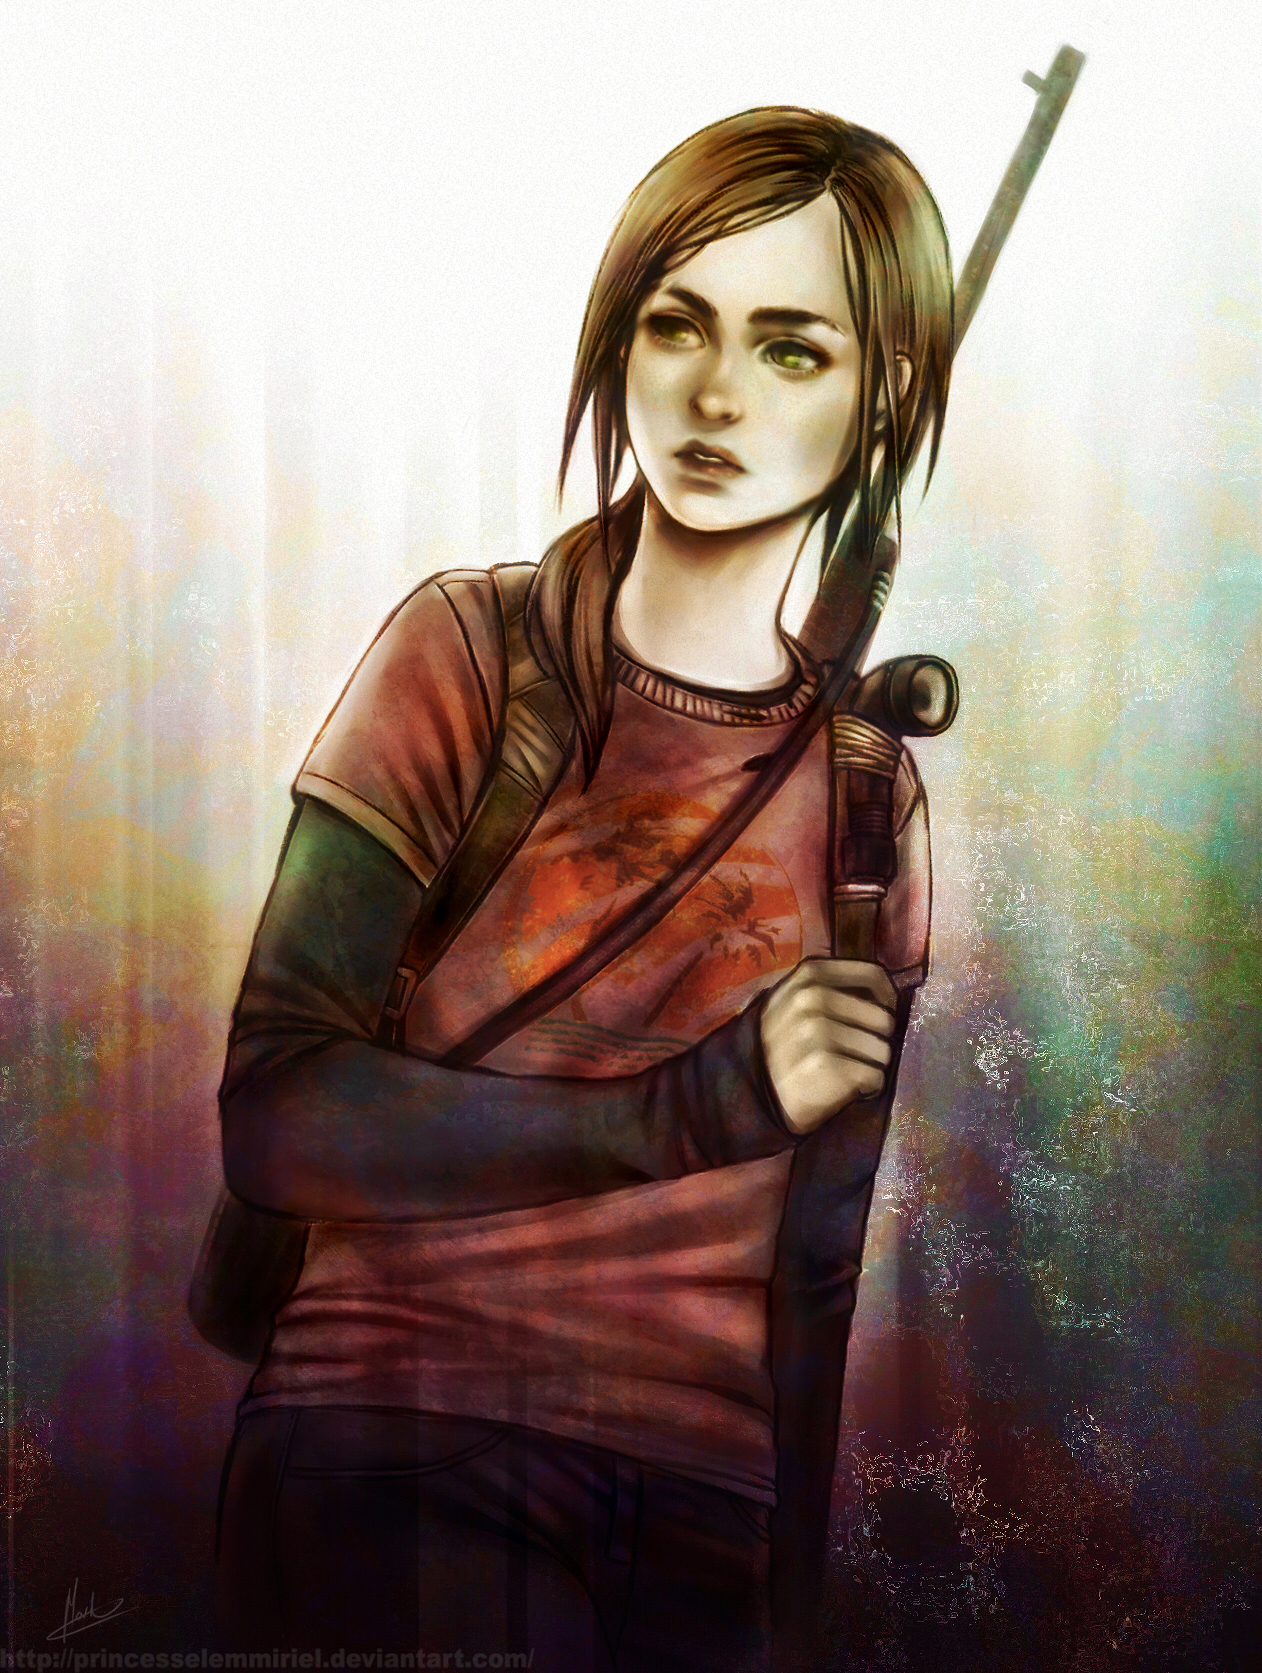 Ellie The Last Of Us Image 2137538 Zerochan Anime Image